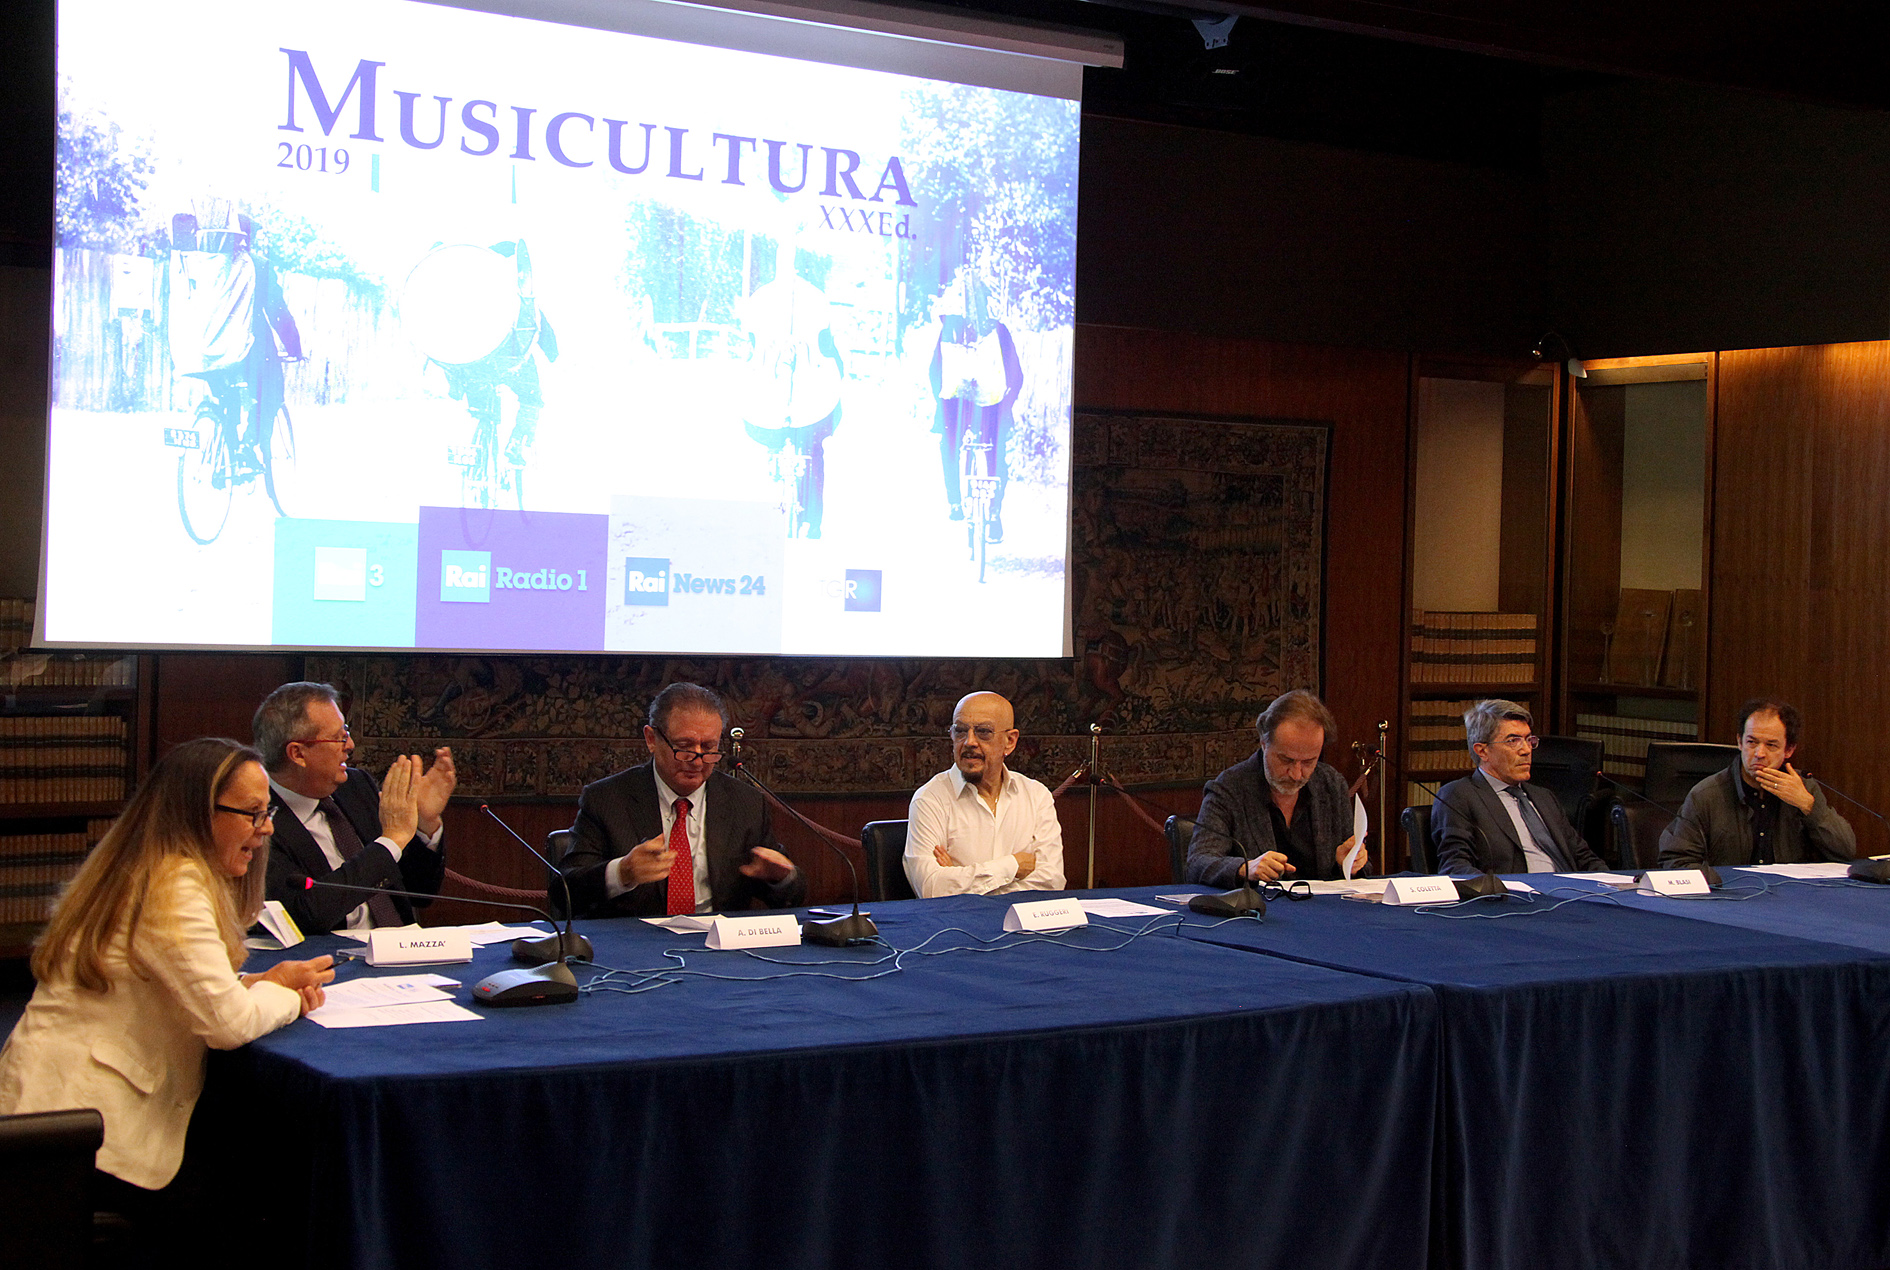 Enrico Ruggeri e Natasha Stefanenko presenteranno Musicultura